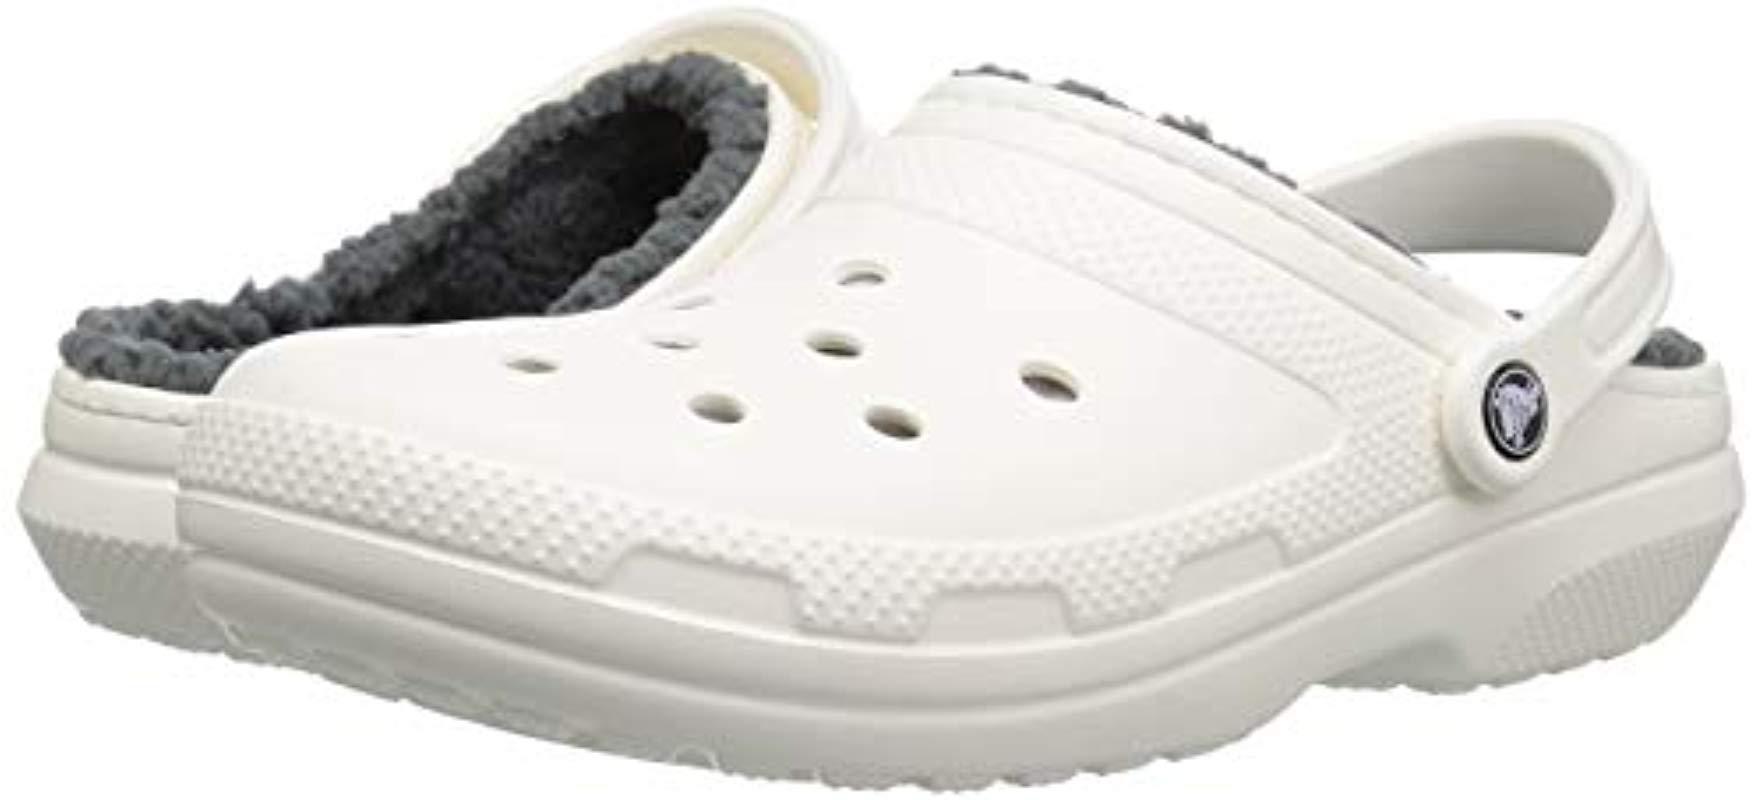 fuzzy crocs white Online shopping has